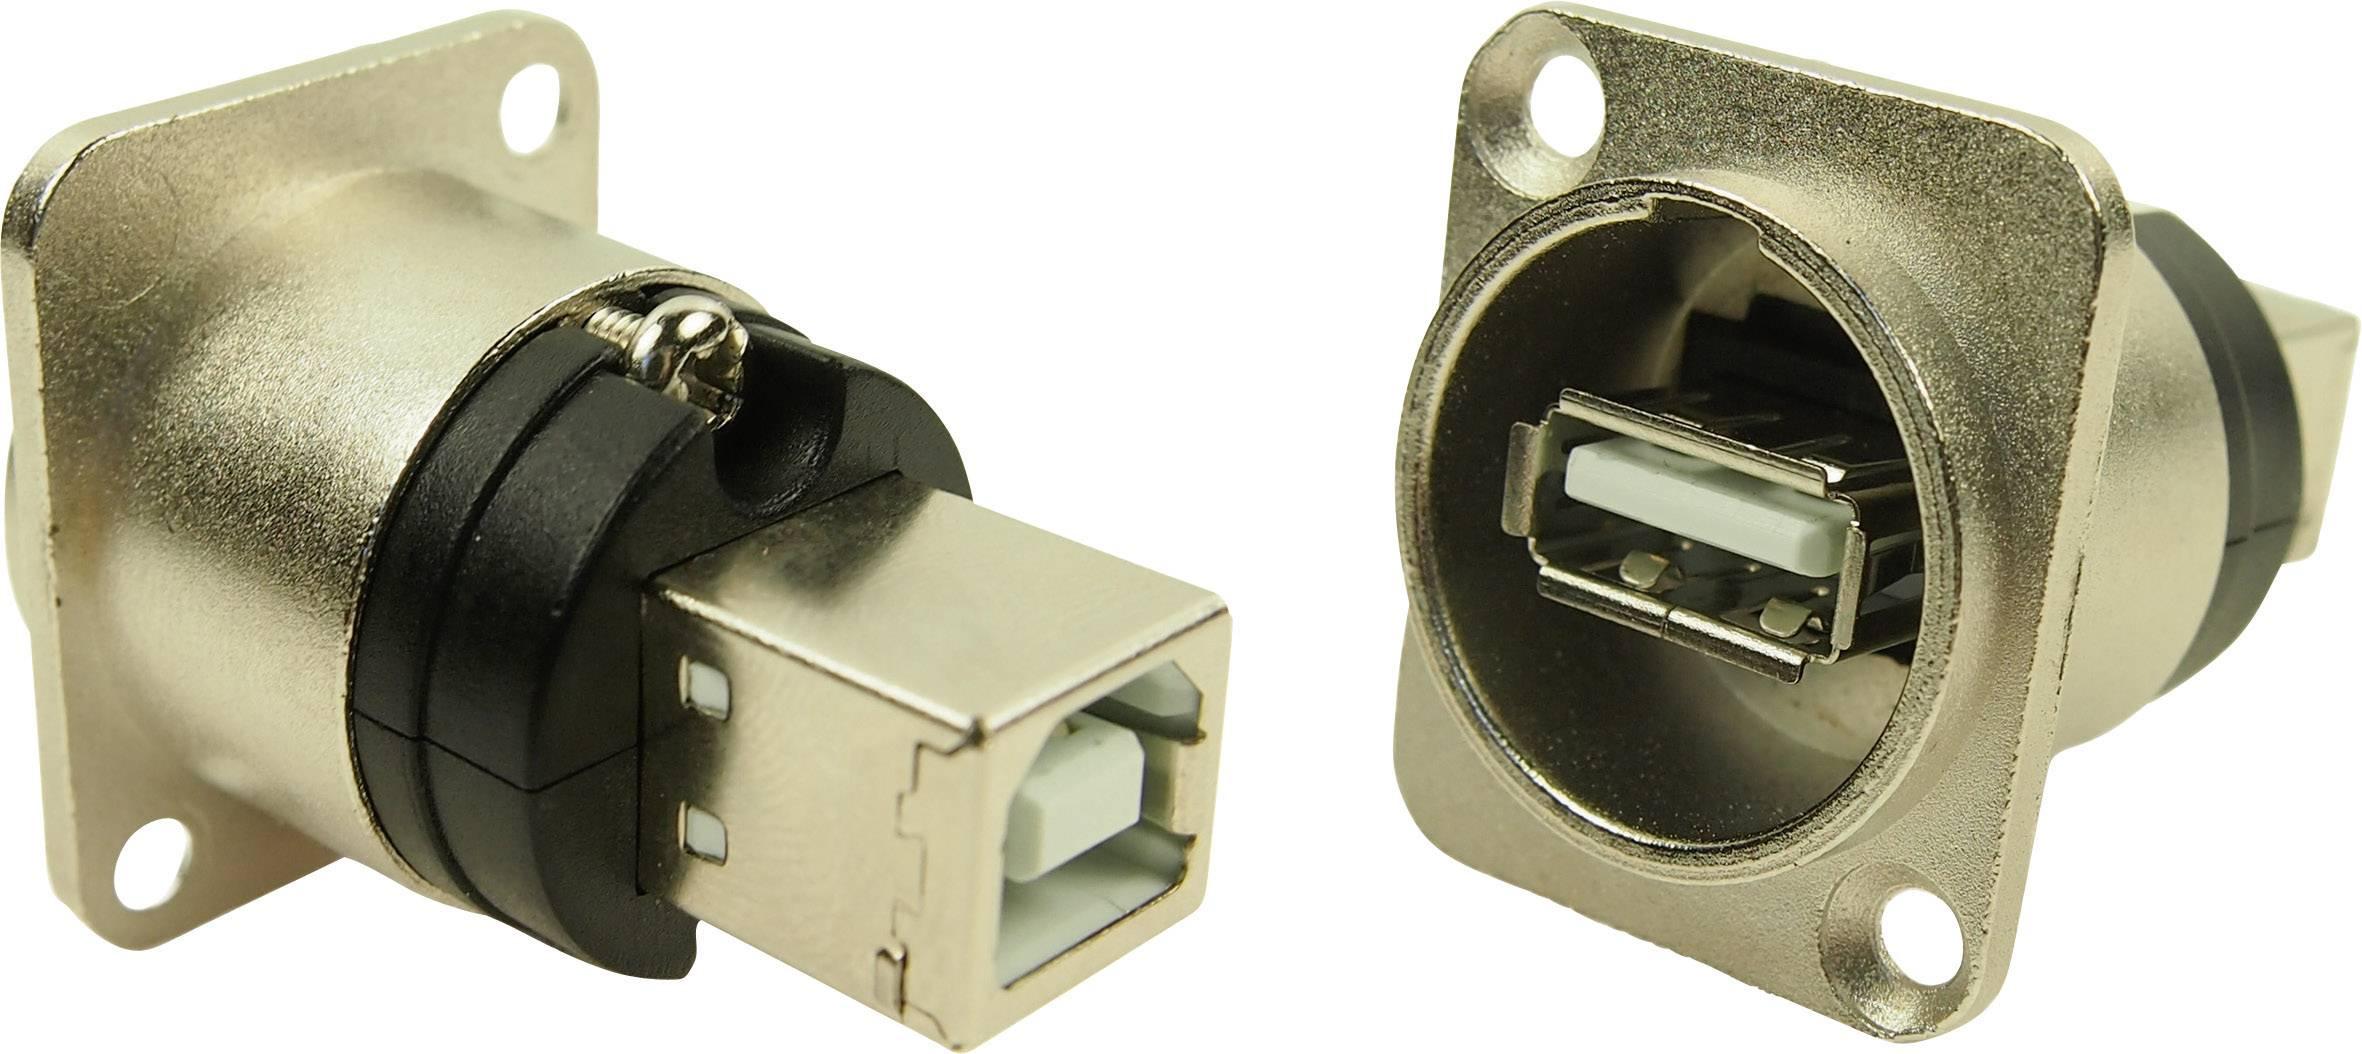 USB 2.0 adaptér, vstavateľný Cliff N/A CP30110, strieborná, 1 ks